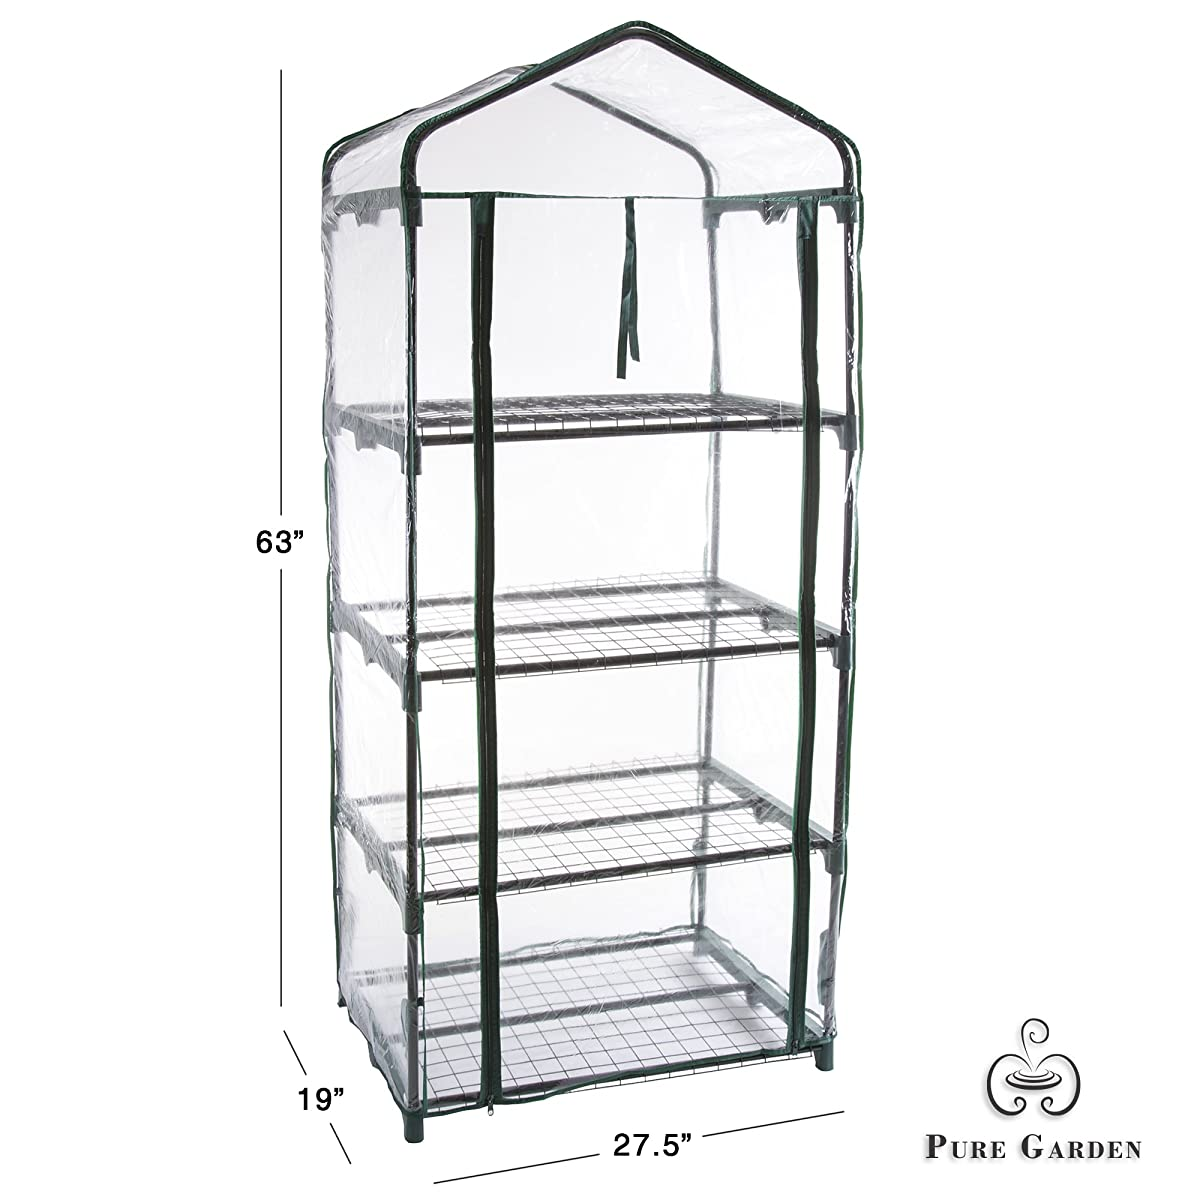 "Pure Garden 4 Tier Mini Greenhouse with Cover, 27.5 x 19 x 63"""